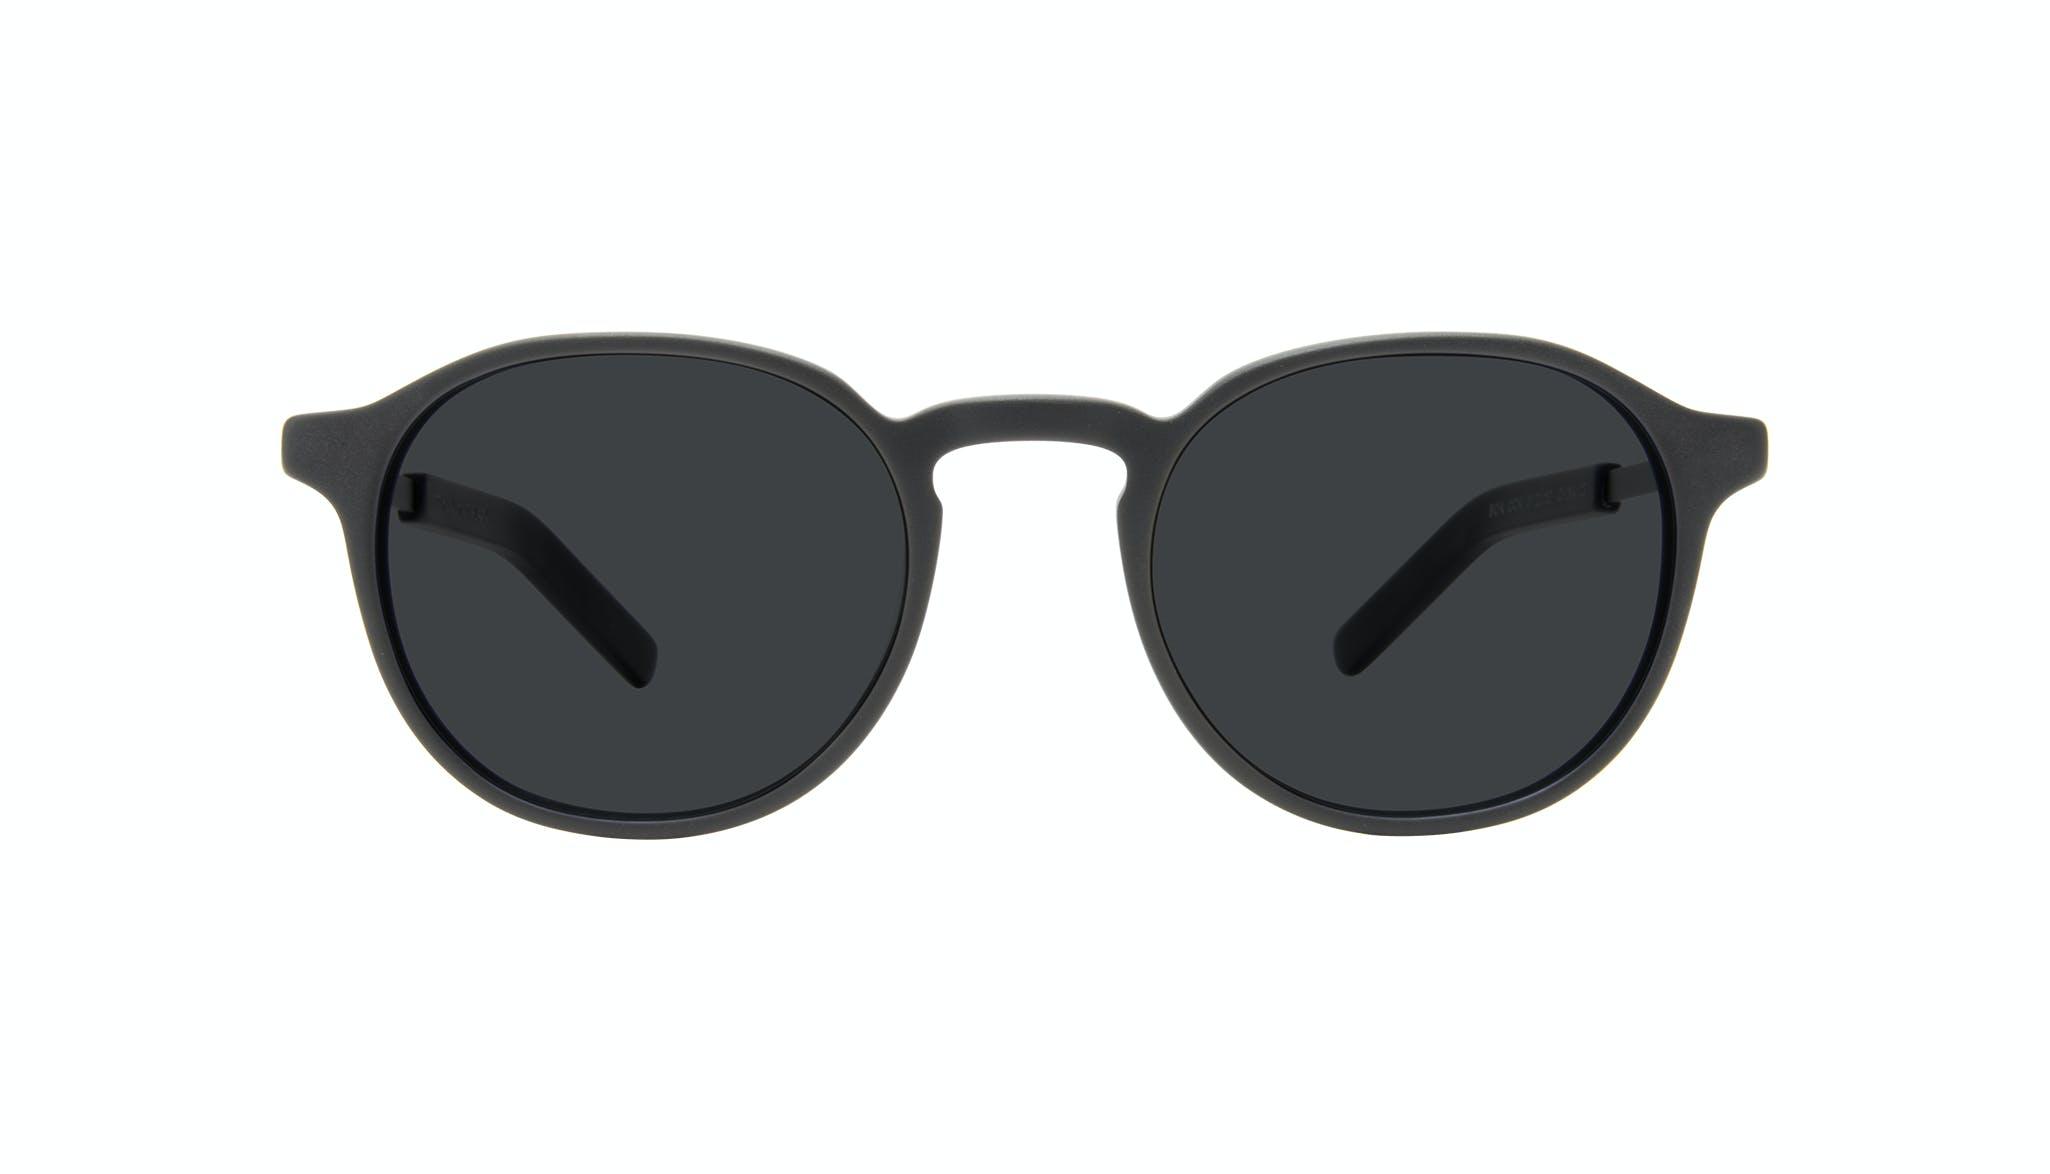 Affordable Fashion Glasses Round Sunglasses Men Prime XL Matte Black Front